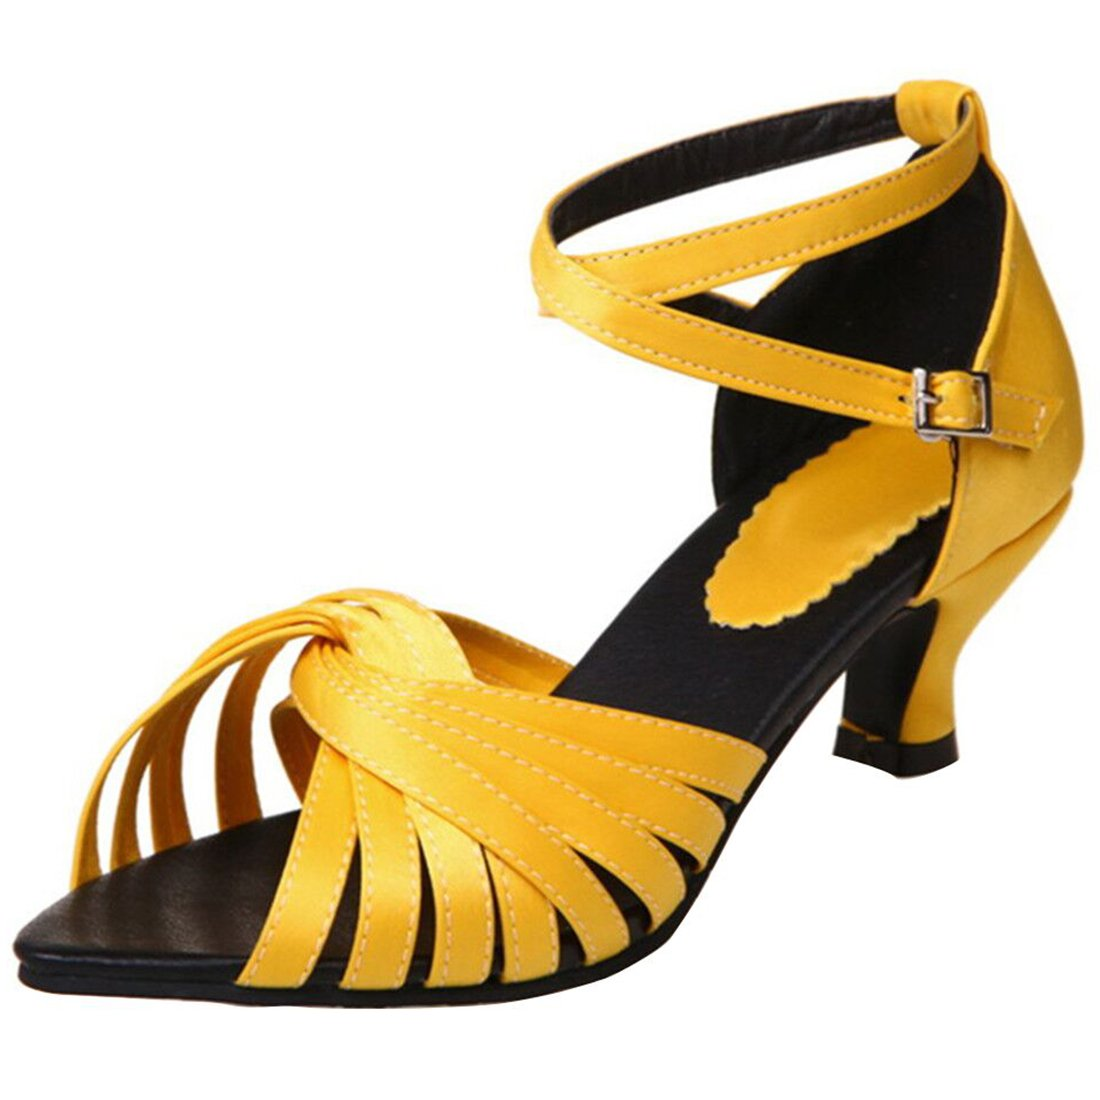 926ef9782ee Artfaerie Women s Kitten Heels Ankle Strap Sandals Latin Dance Dance Dance Court  Shoes 12.5 B(M) US